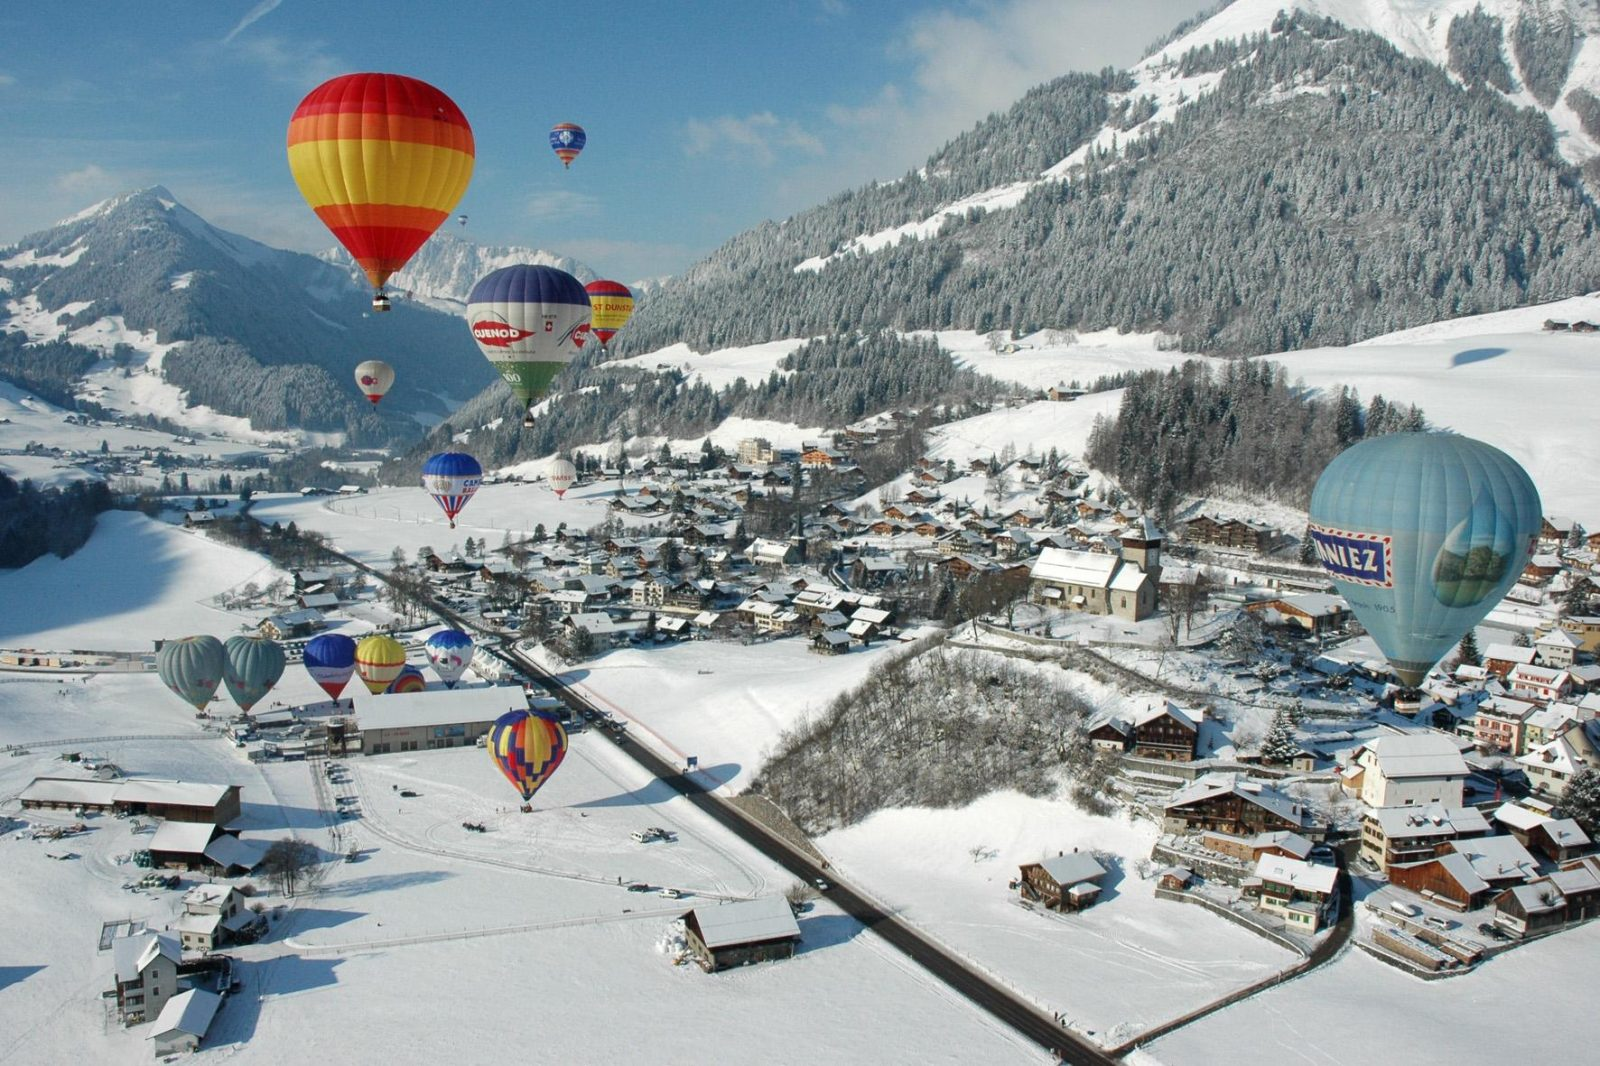 Château-d'Oex in switzerland hot air balloon festival unique destinations in europe